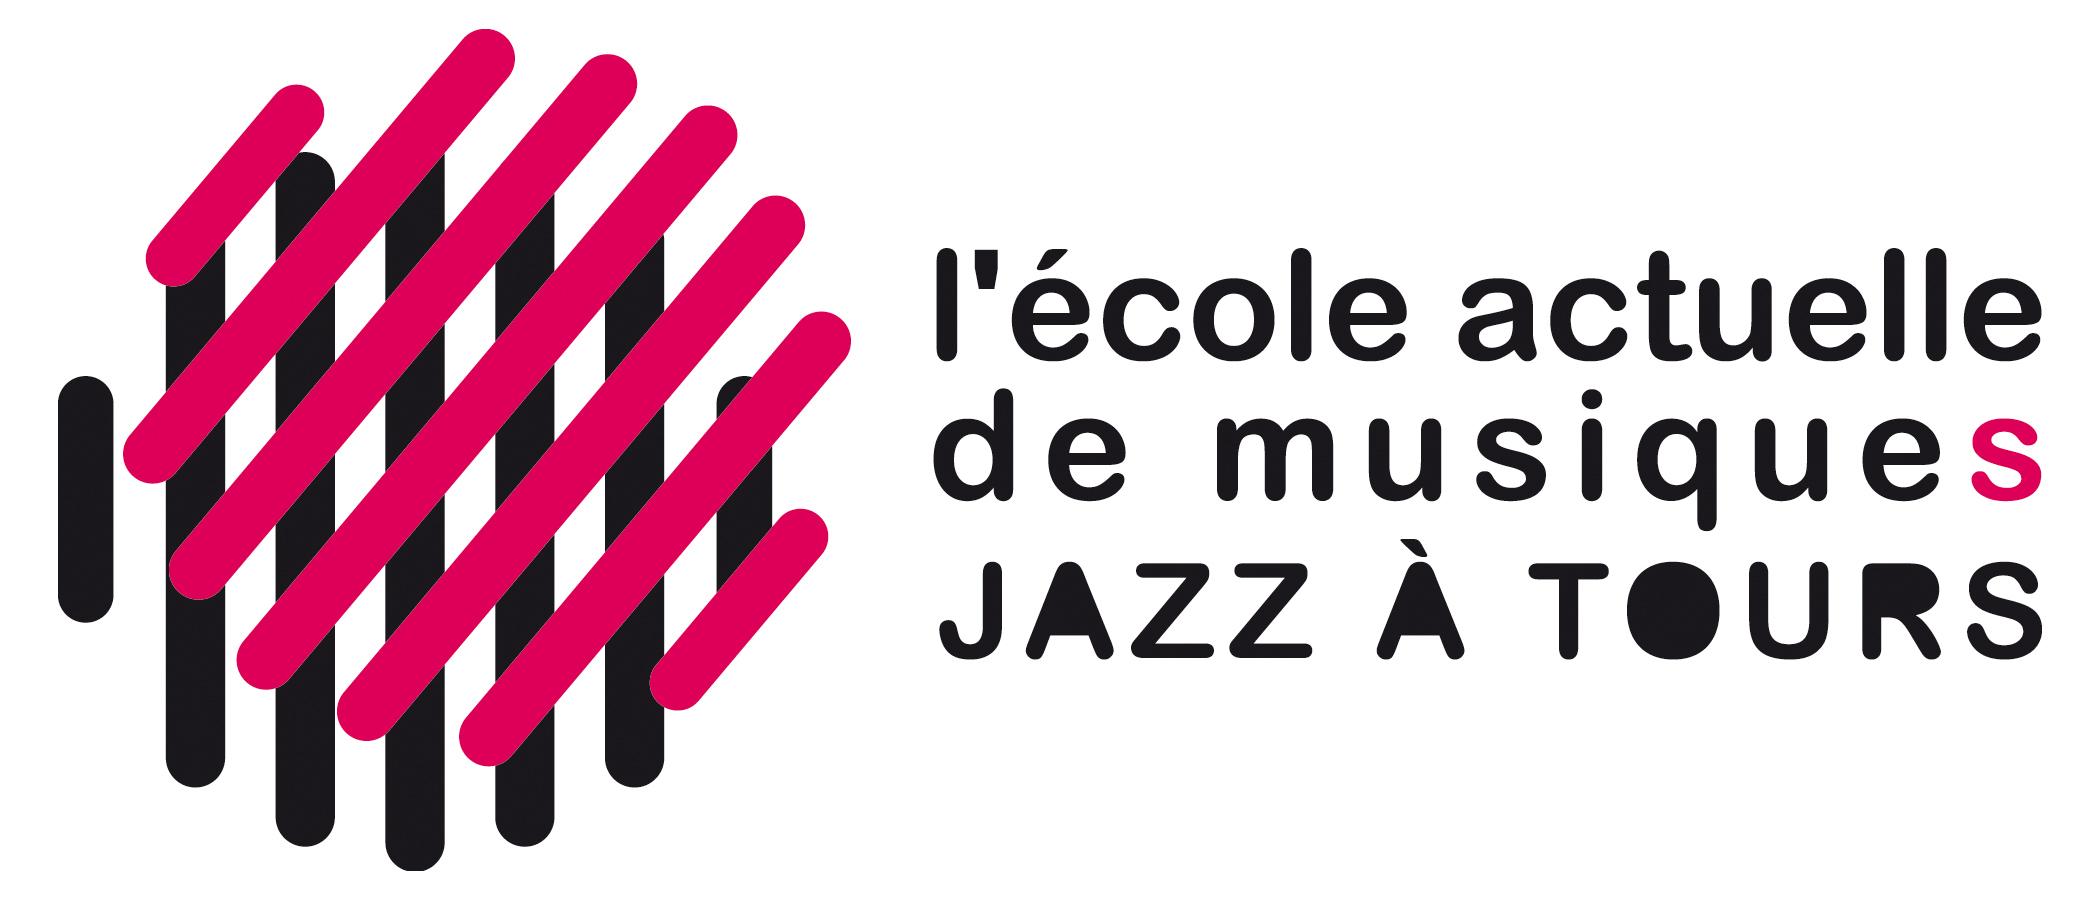 http://www.jazzatours.com/